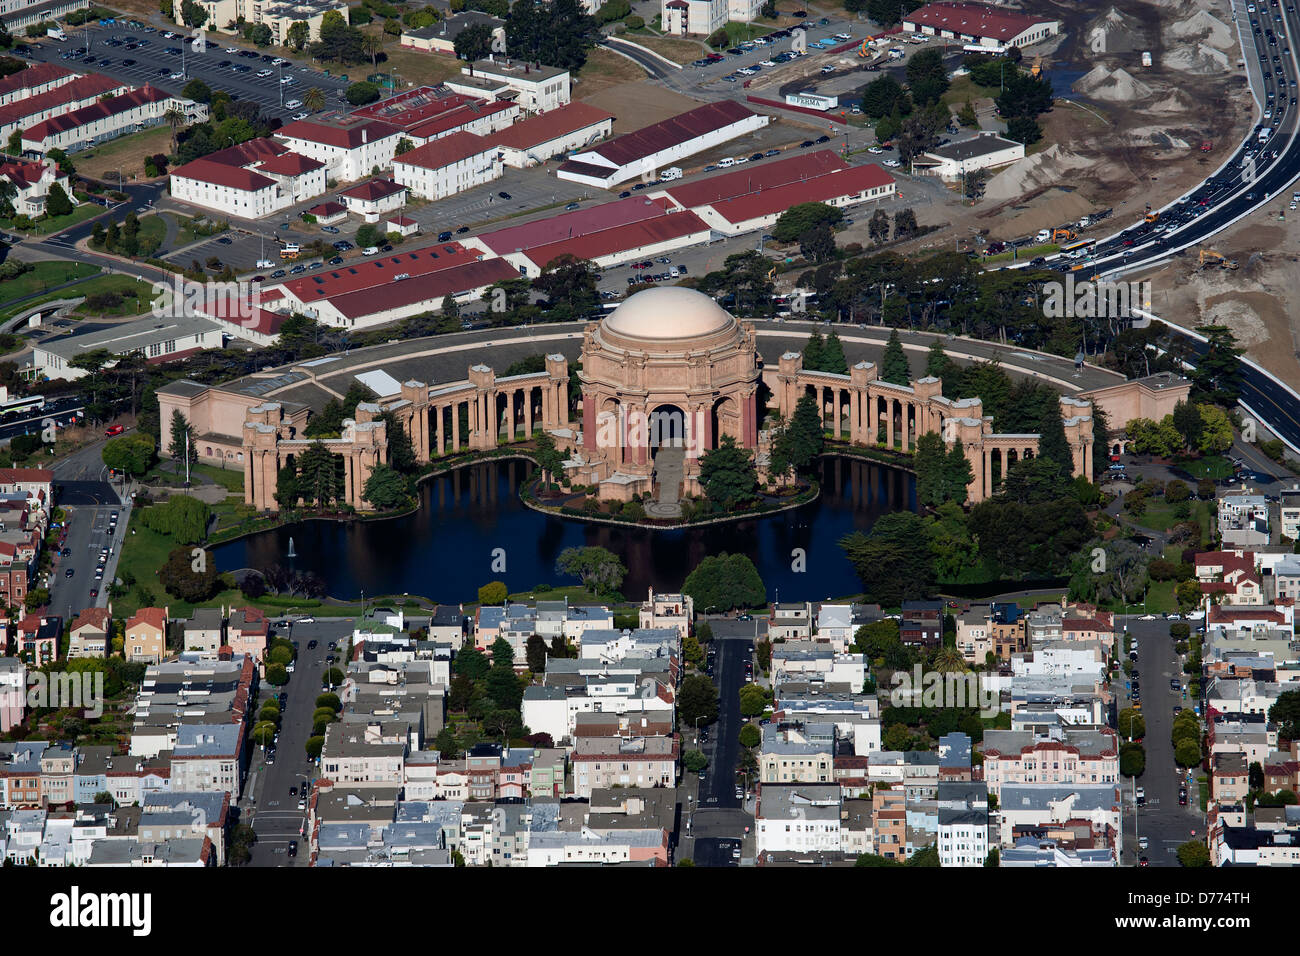 Luftaufnahme Palace of Fine Arts, San Francisco, Kalifornien Stockbild